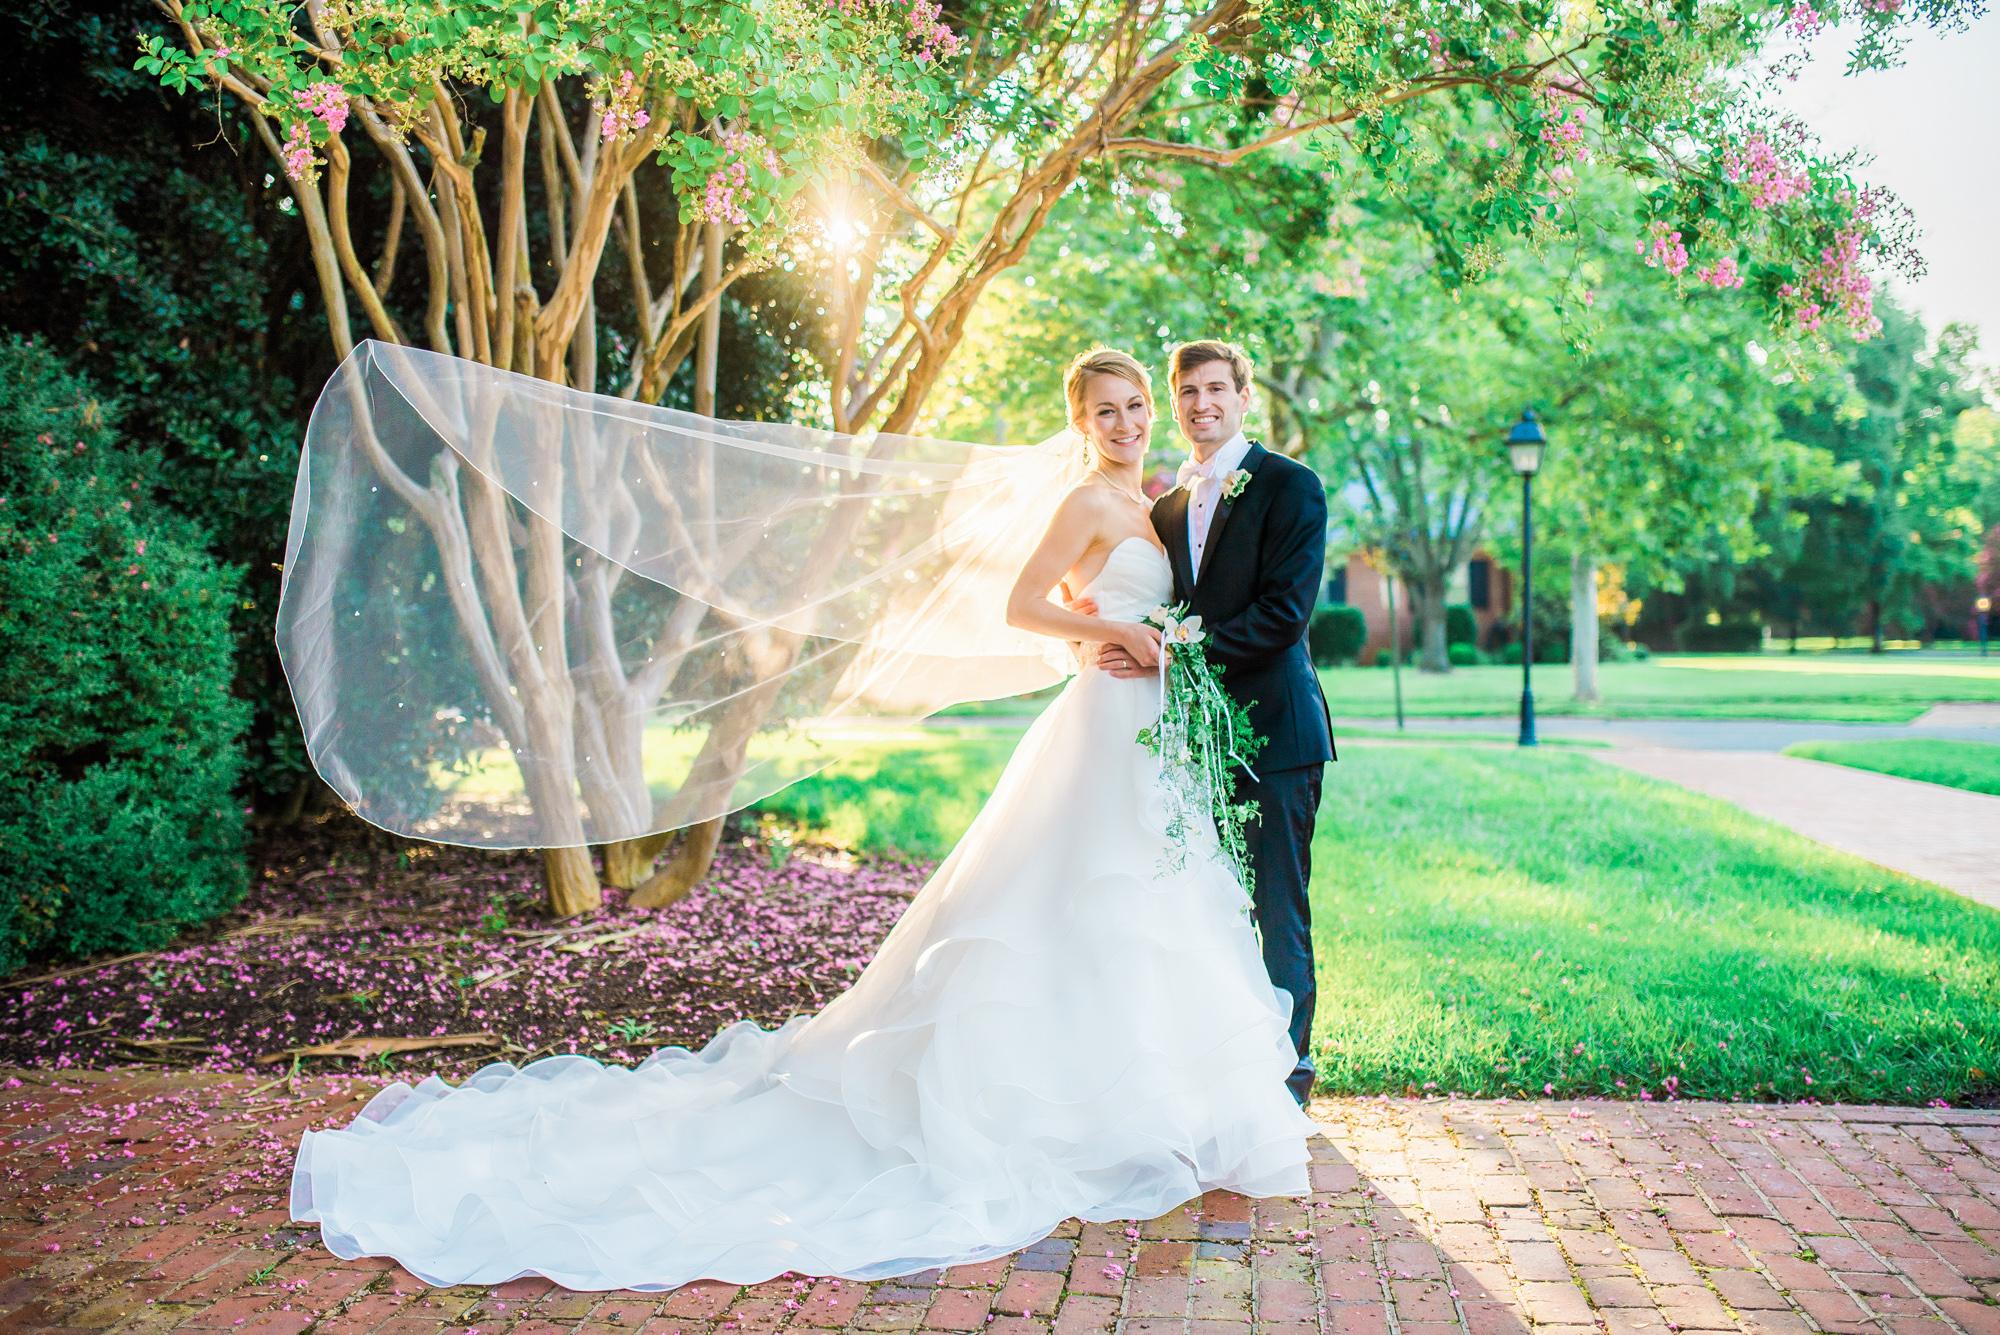 88lovestories-wedding_0021.jpg